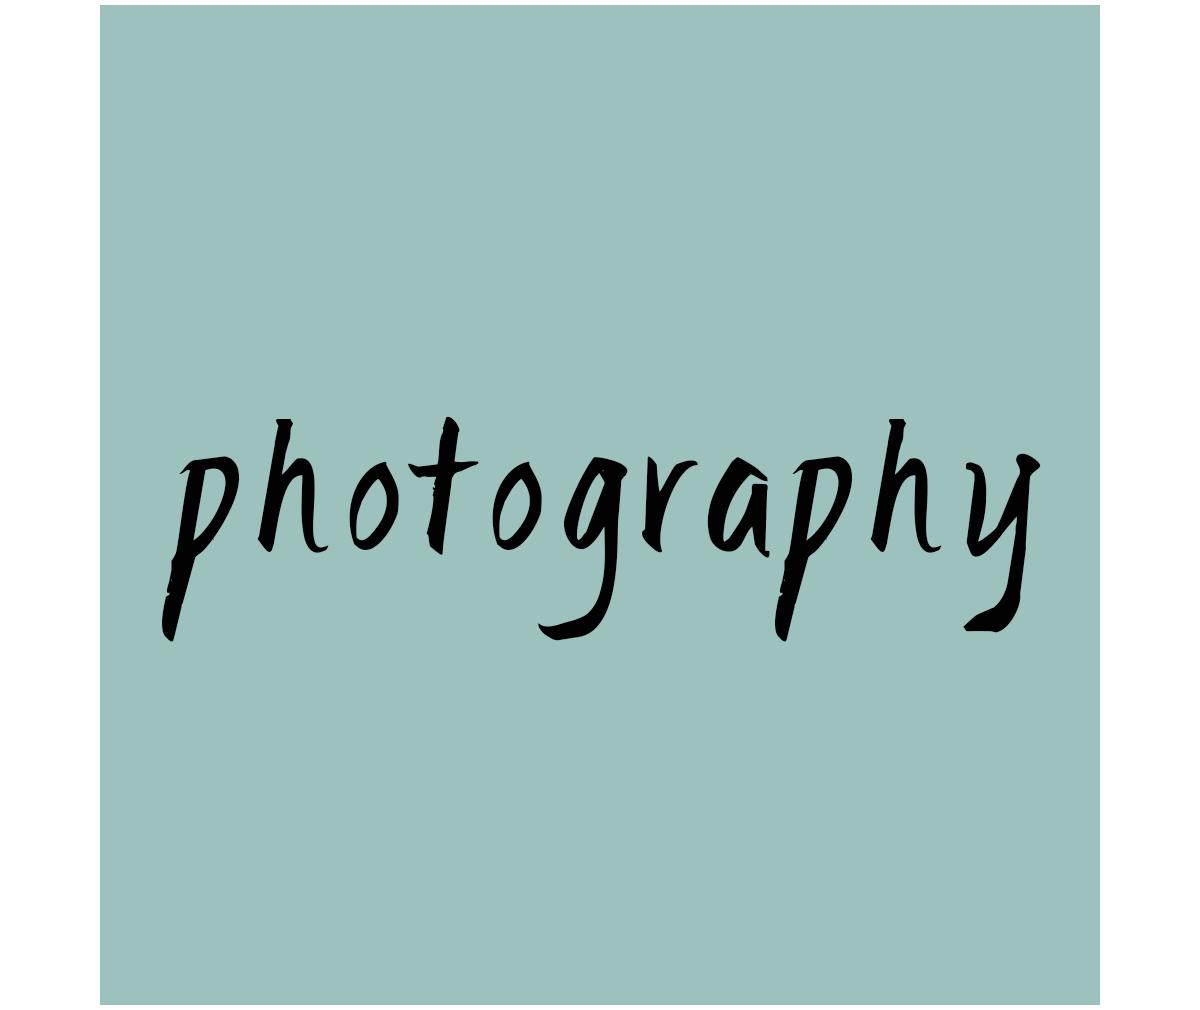 photog-circle.png